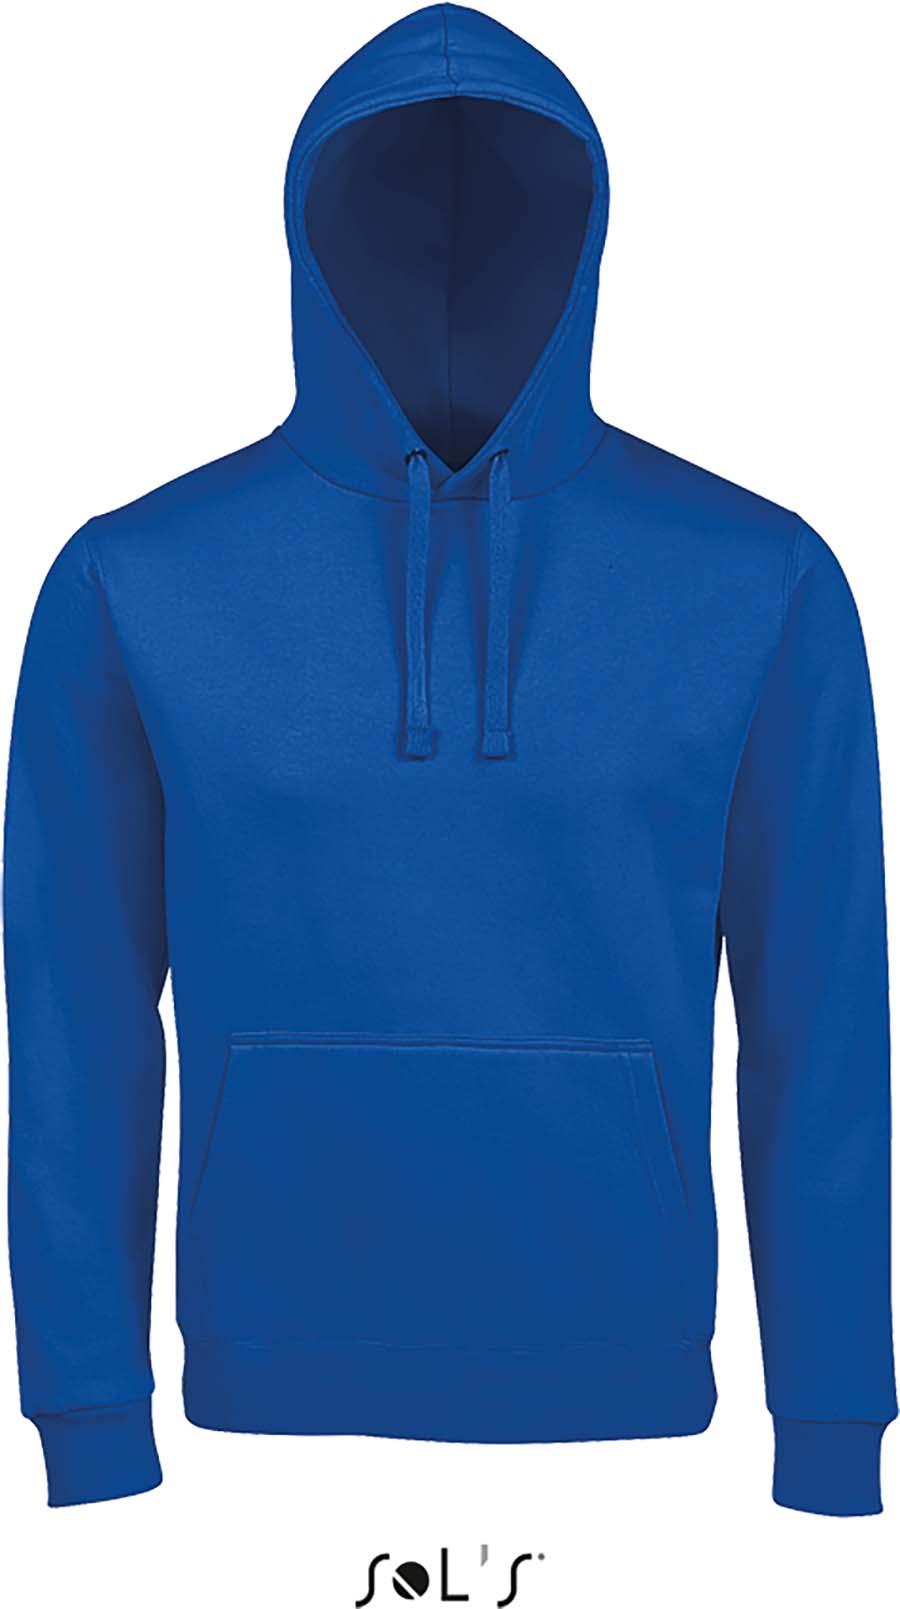 Sweat-shirt unisexe à capuche - 1-1403-1